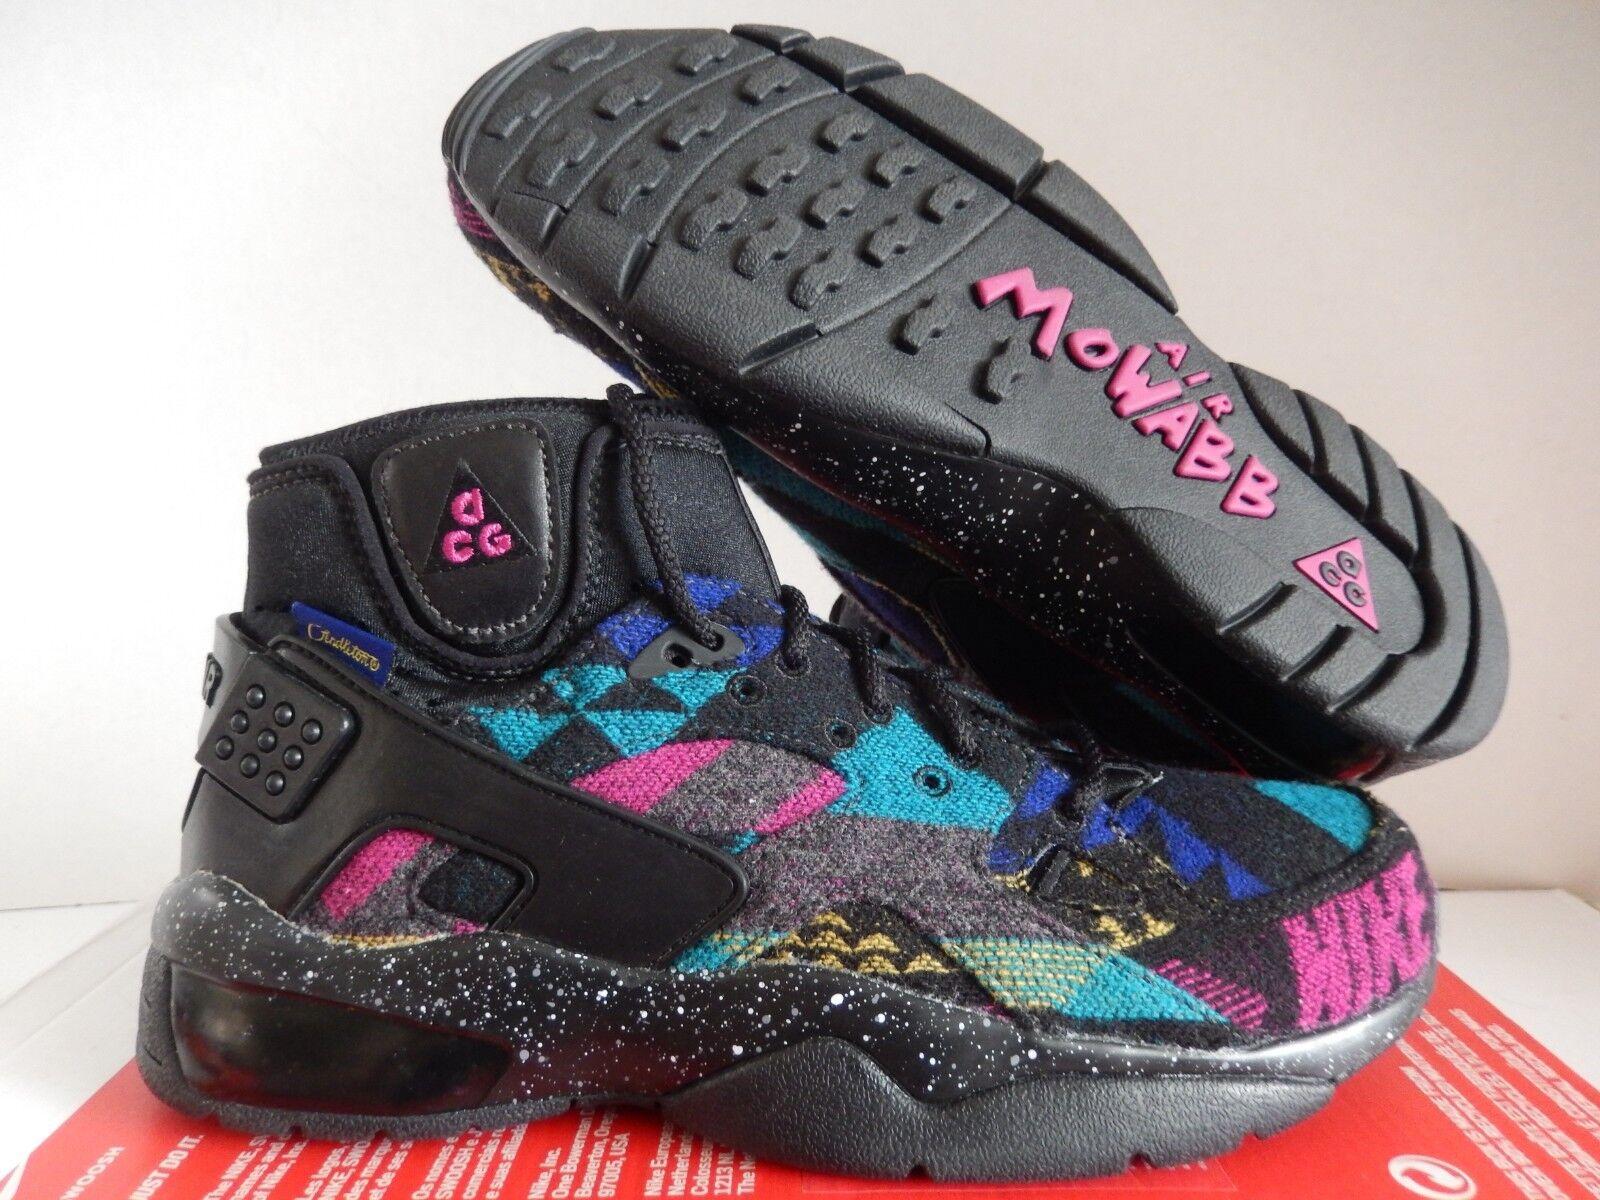 Para hombres Multi Nike Air MOWABB Acg Pendleton ID Multi hombres Color [AQ7000-991] 8b92e0